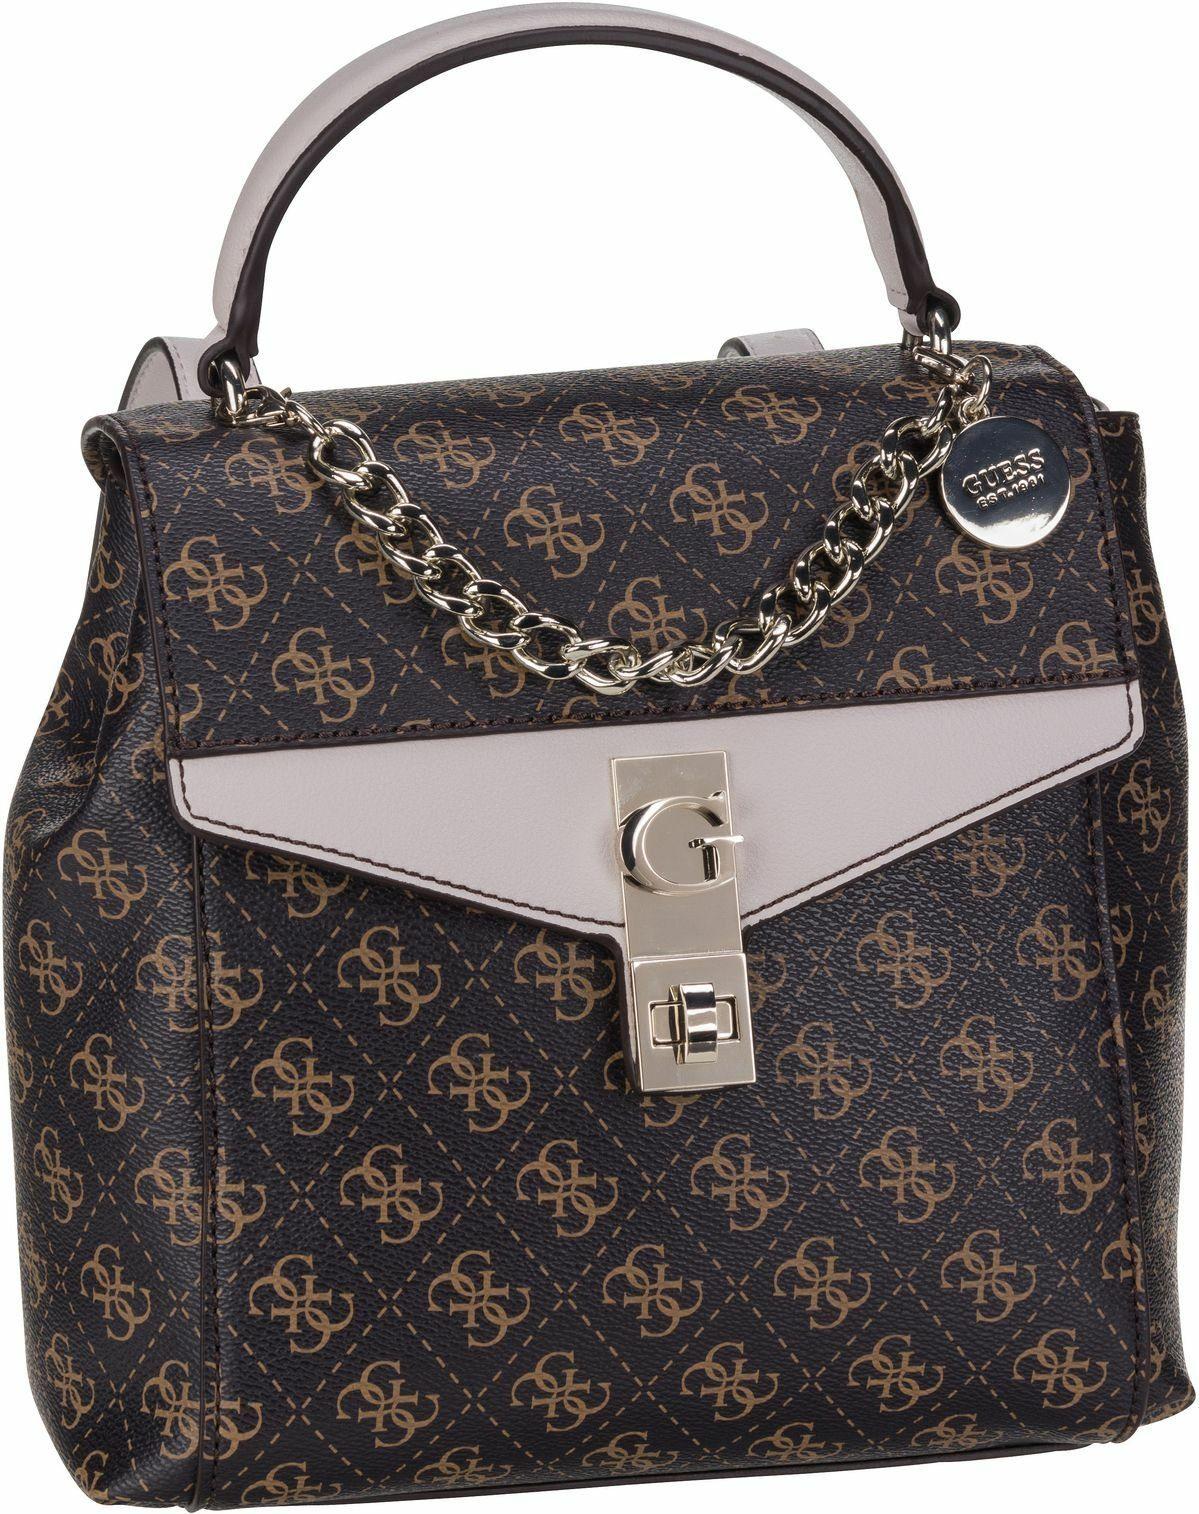 Guess Rucksack Daypack »Lorenna Convertible Backpack« online kaufen | OTTO